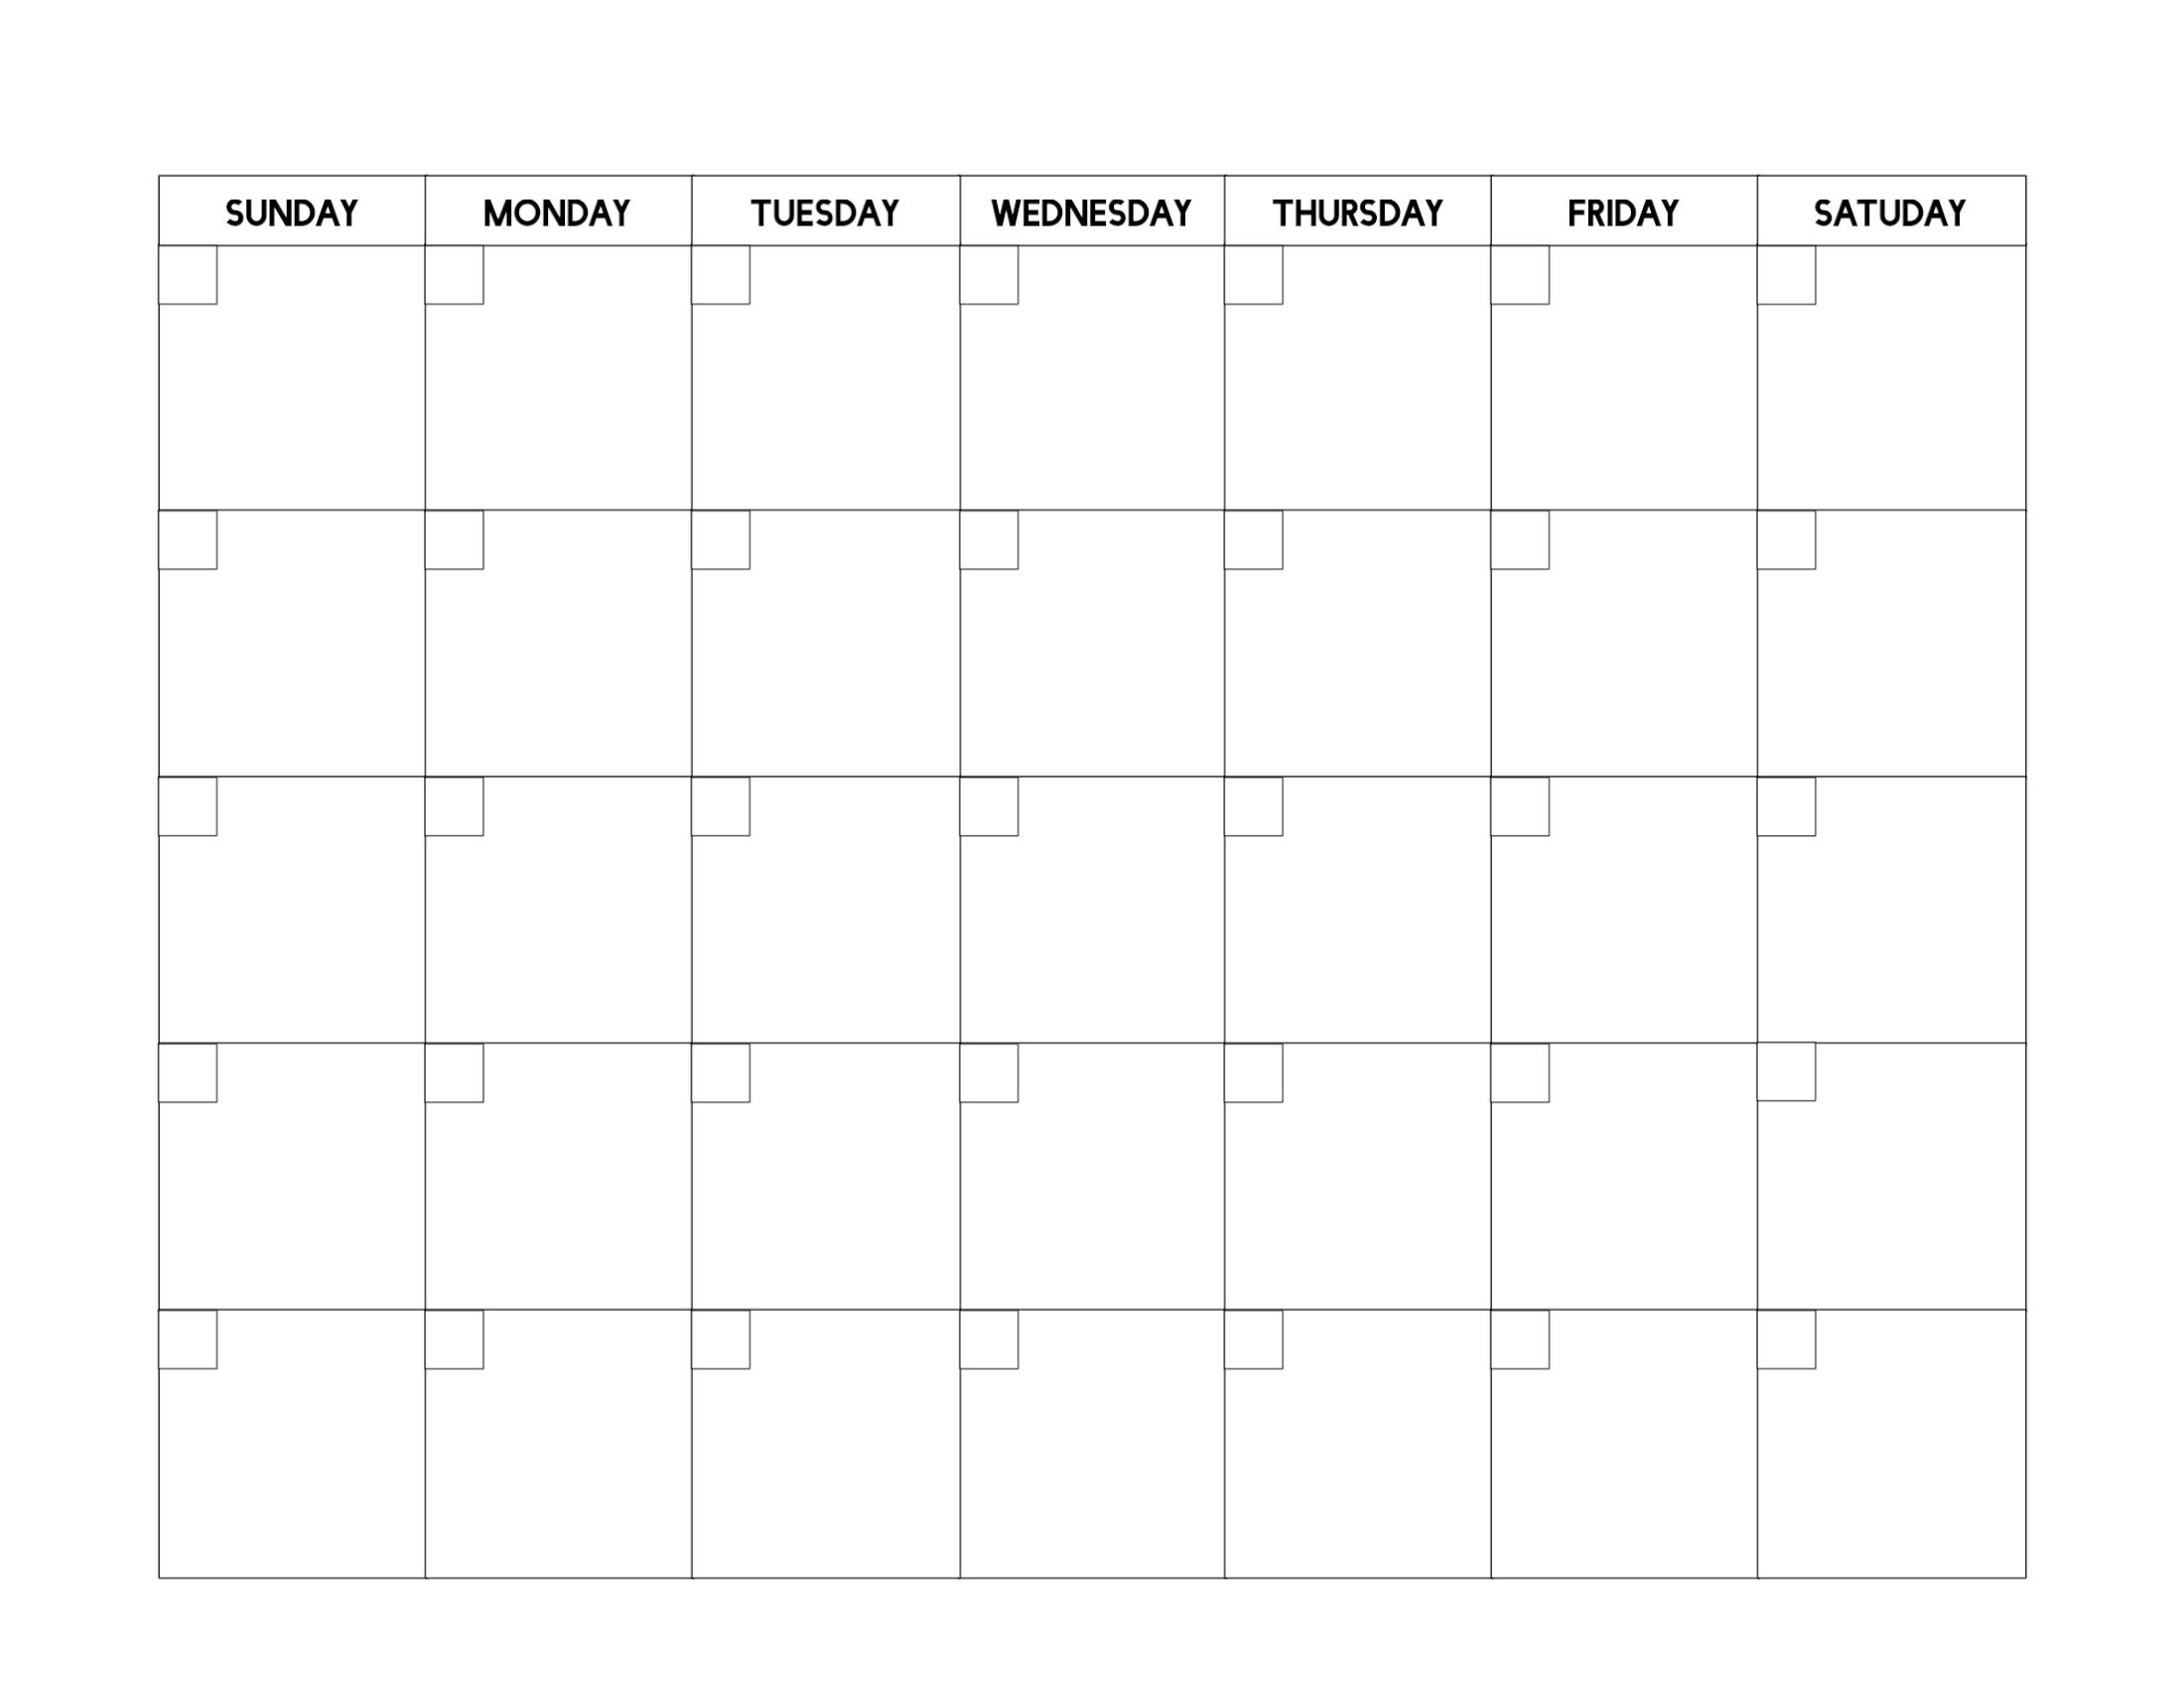 Free Printable Blank Calendar Template - Paper Trail Design regarding Free Blank Calendar Sheets